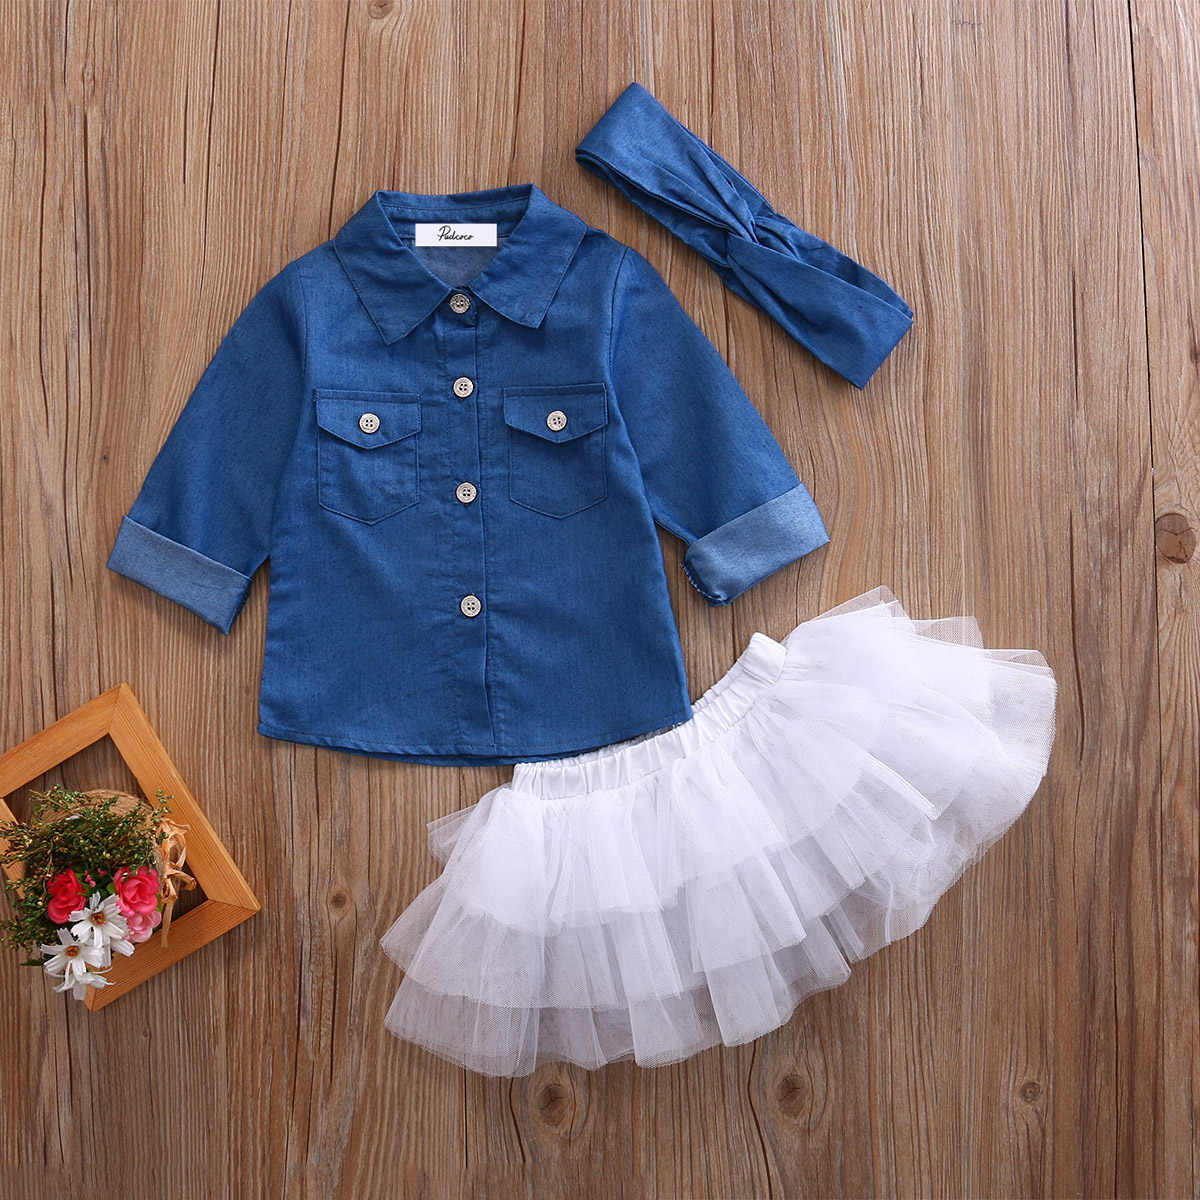 39e00f33c73 Kids Baby Girls Denim Tops T shirt+White Tutu Skirts+Headband 3pcs Outfits  Clothes